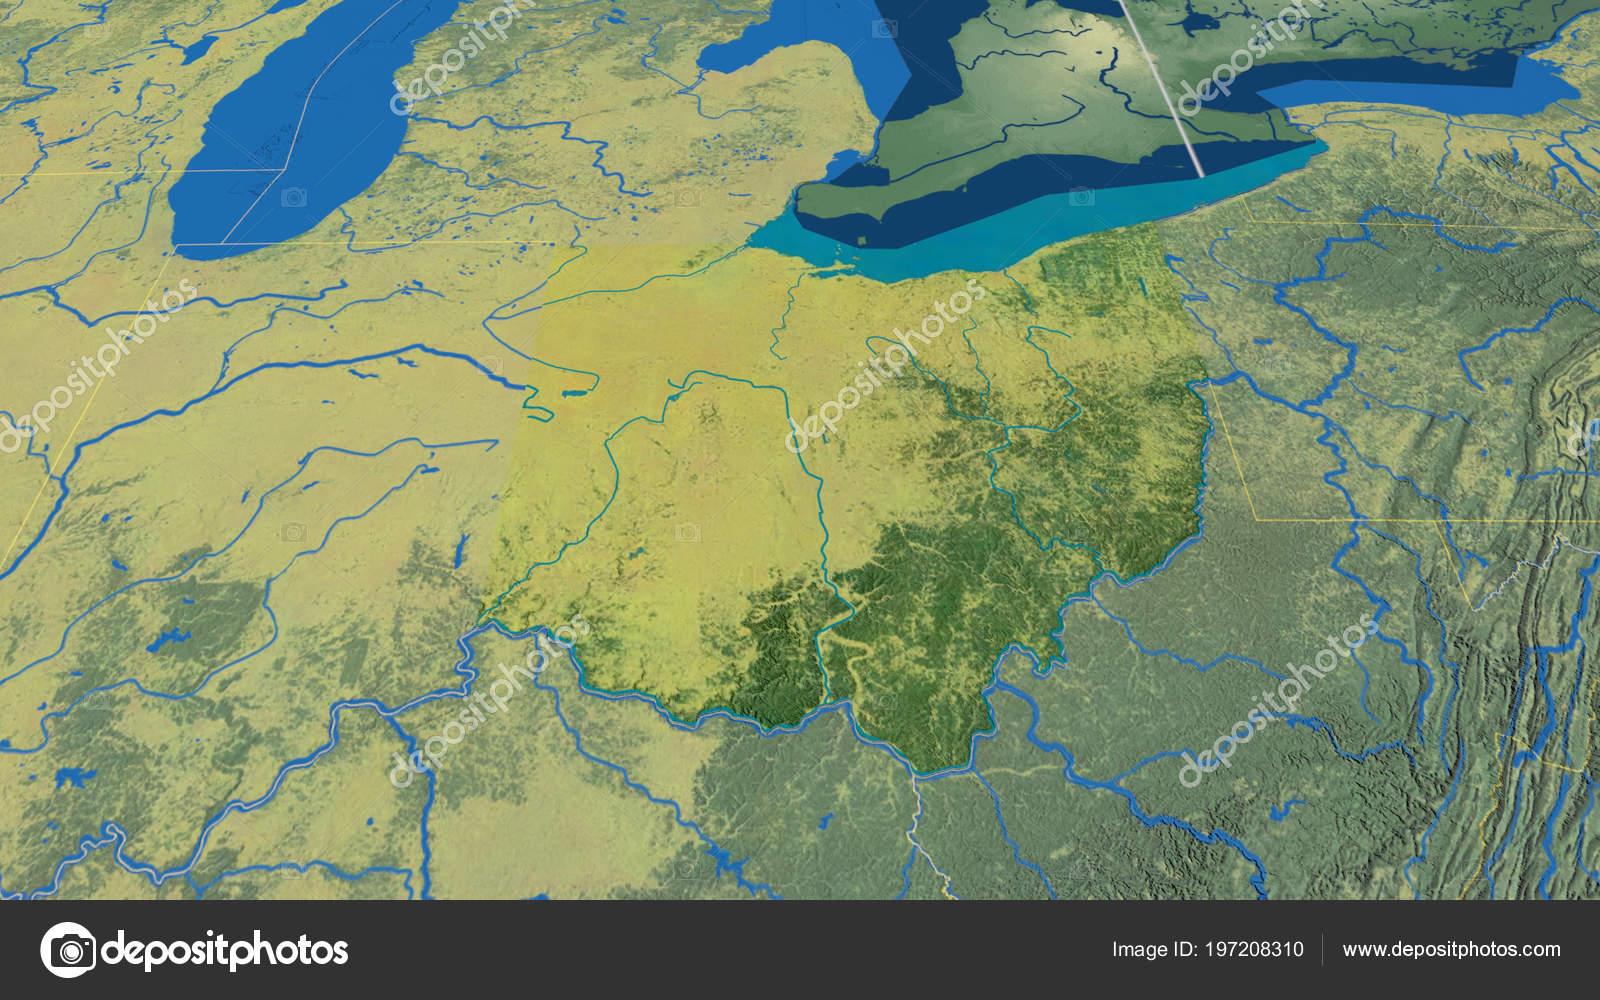 Ohio Region United States Extruded Topographic Map — Stock Photo on